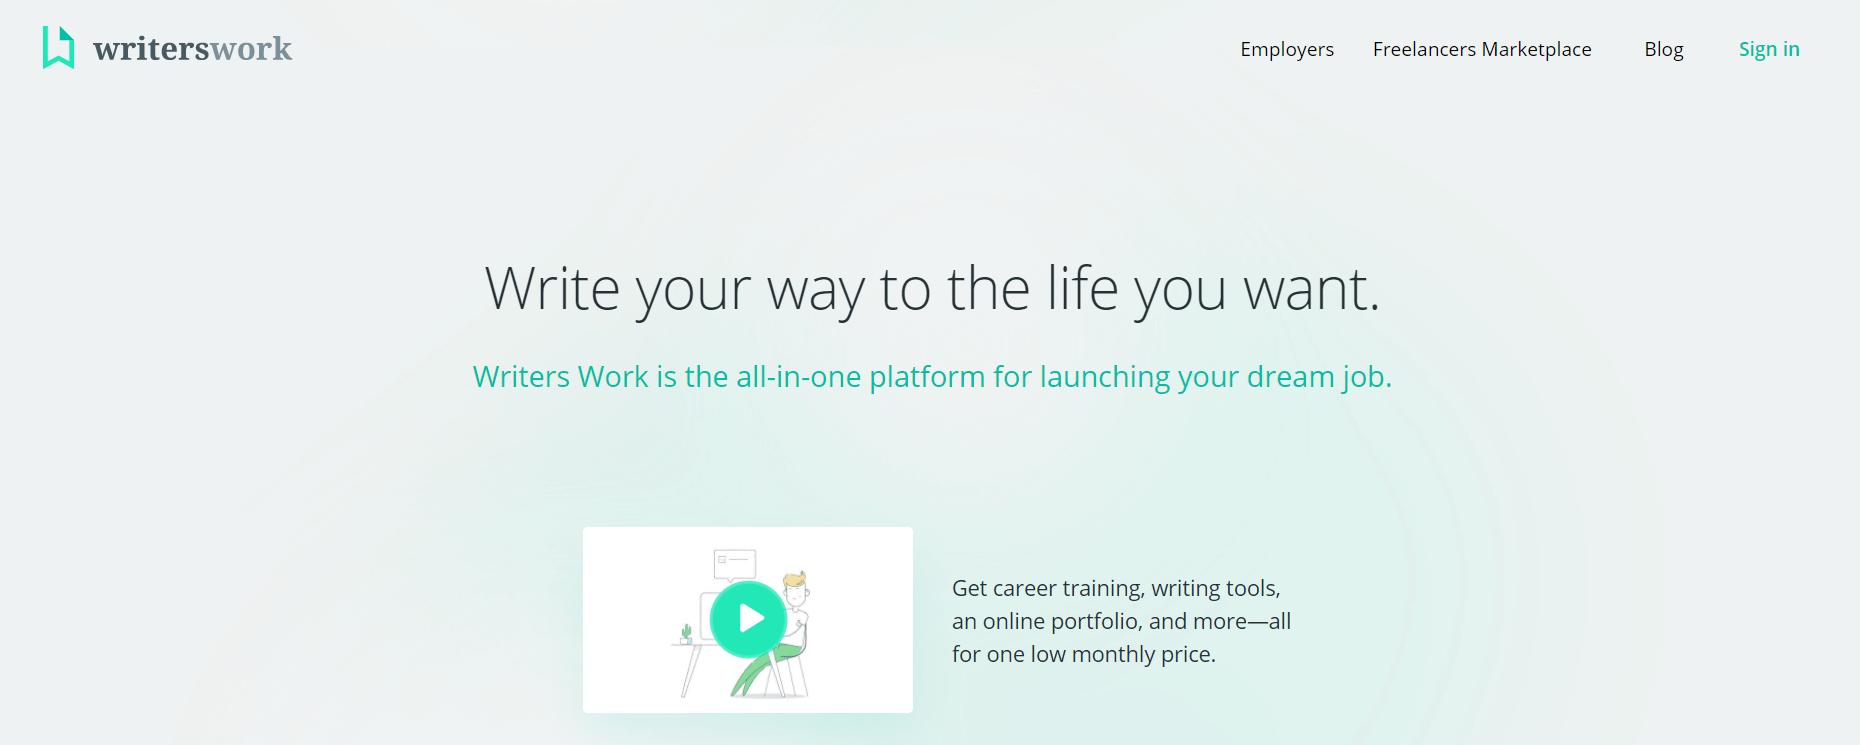 Writers Work是寻找自由内容营销工作的平台。